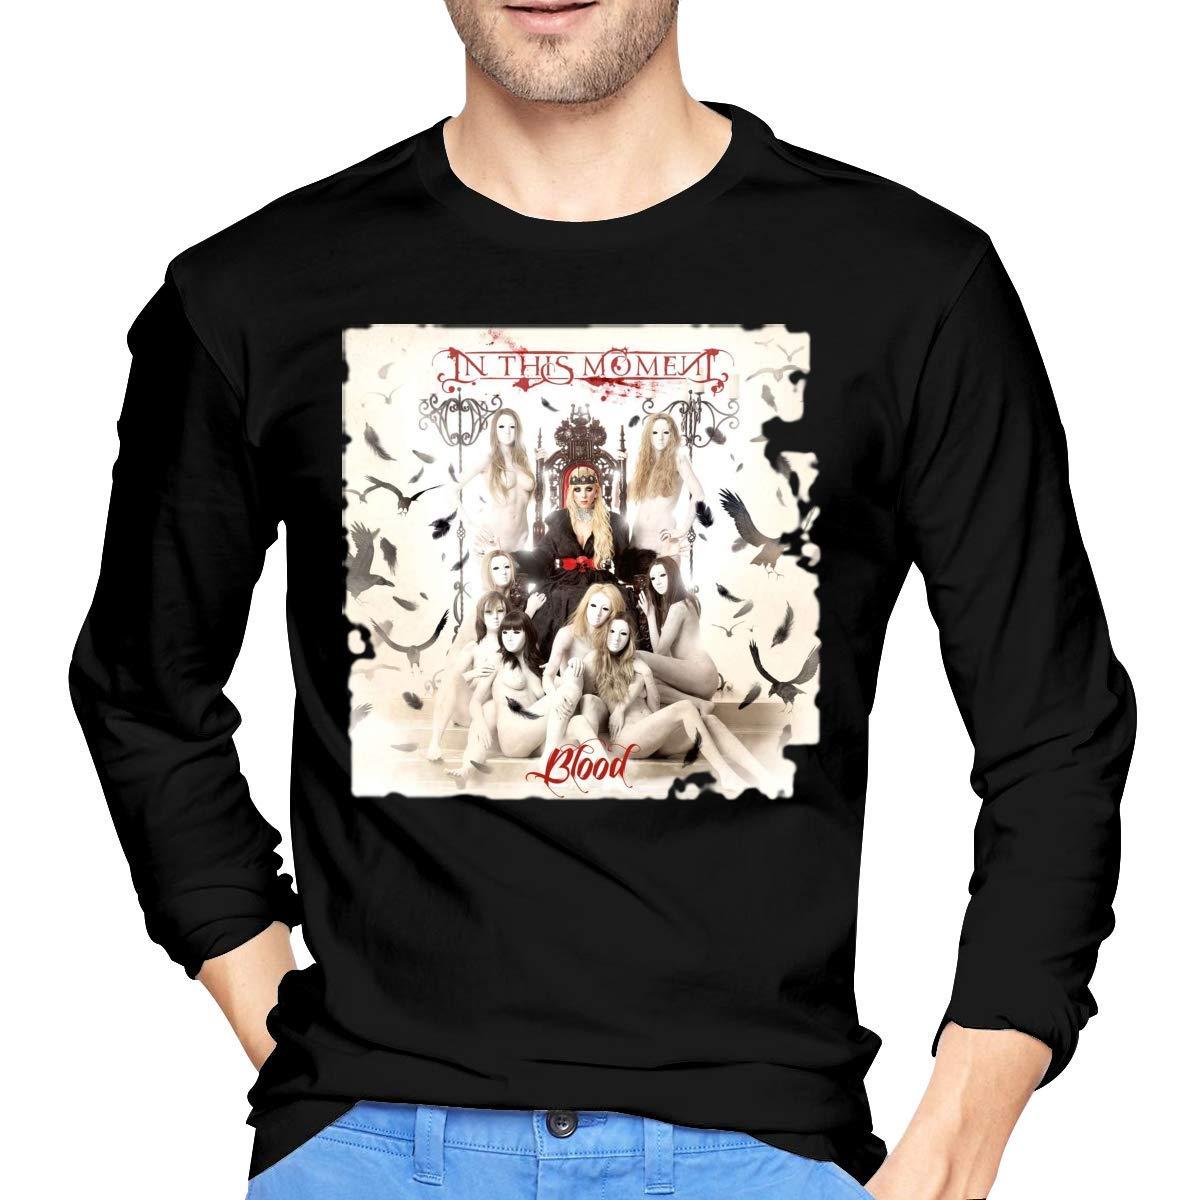 Fssatung S In This Mot Blood Tee Black Shirts